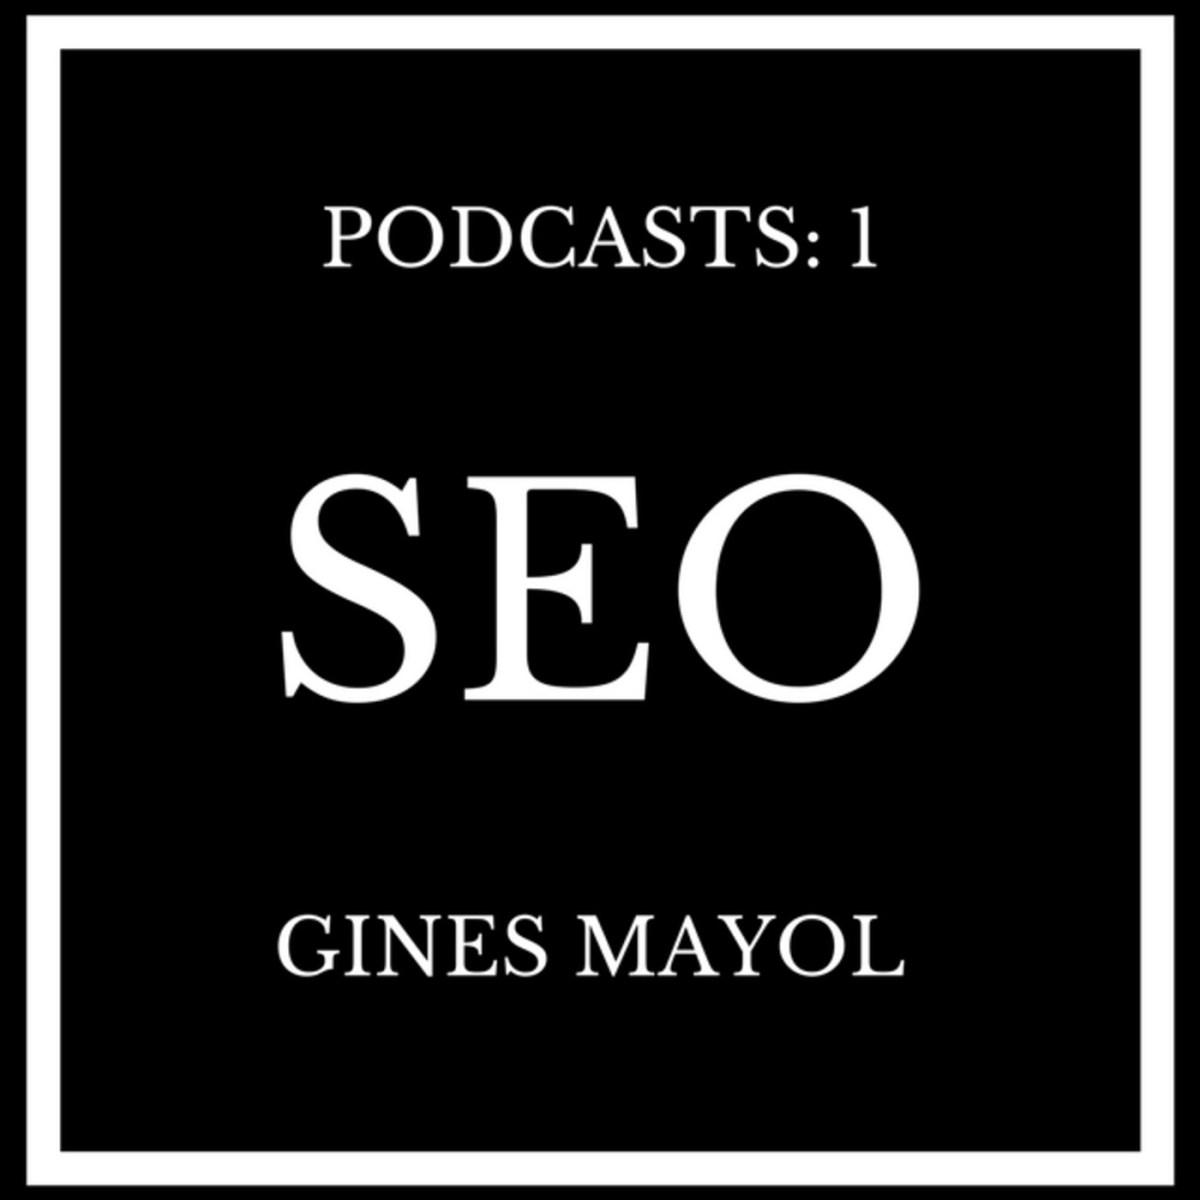 Gines Mayol - SEO